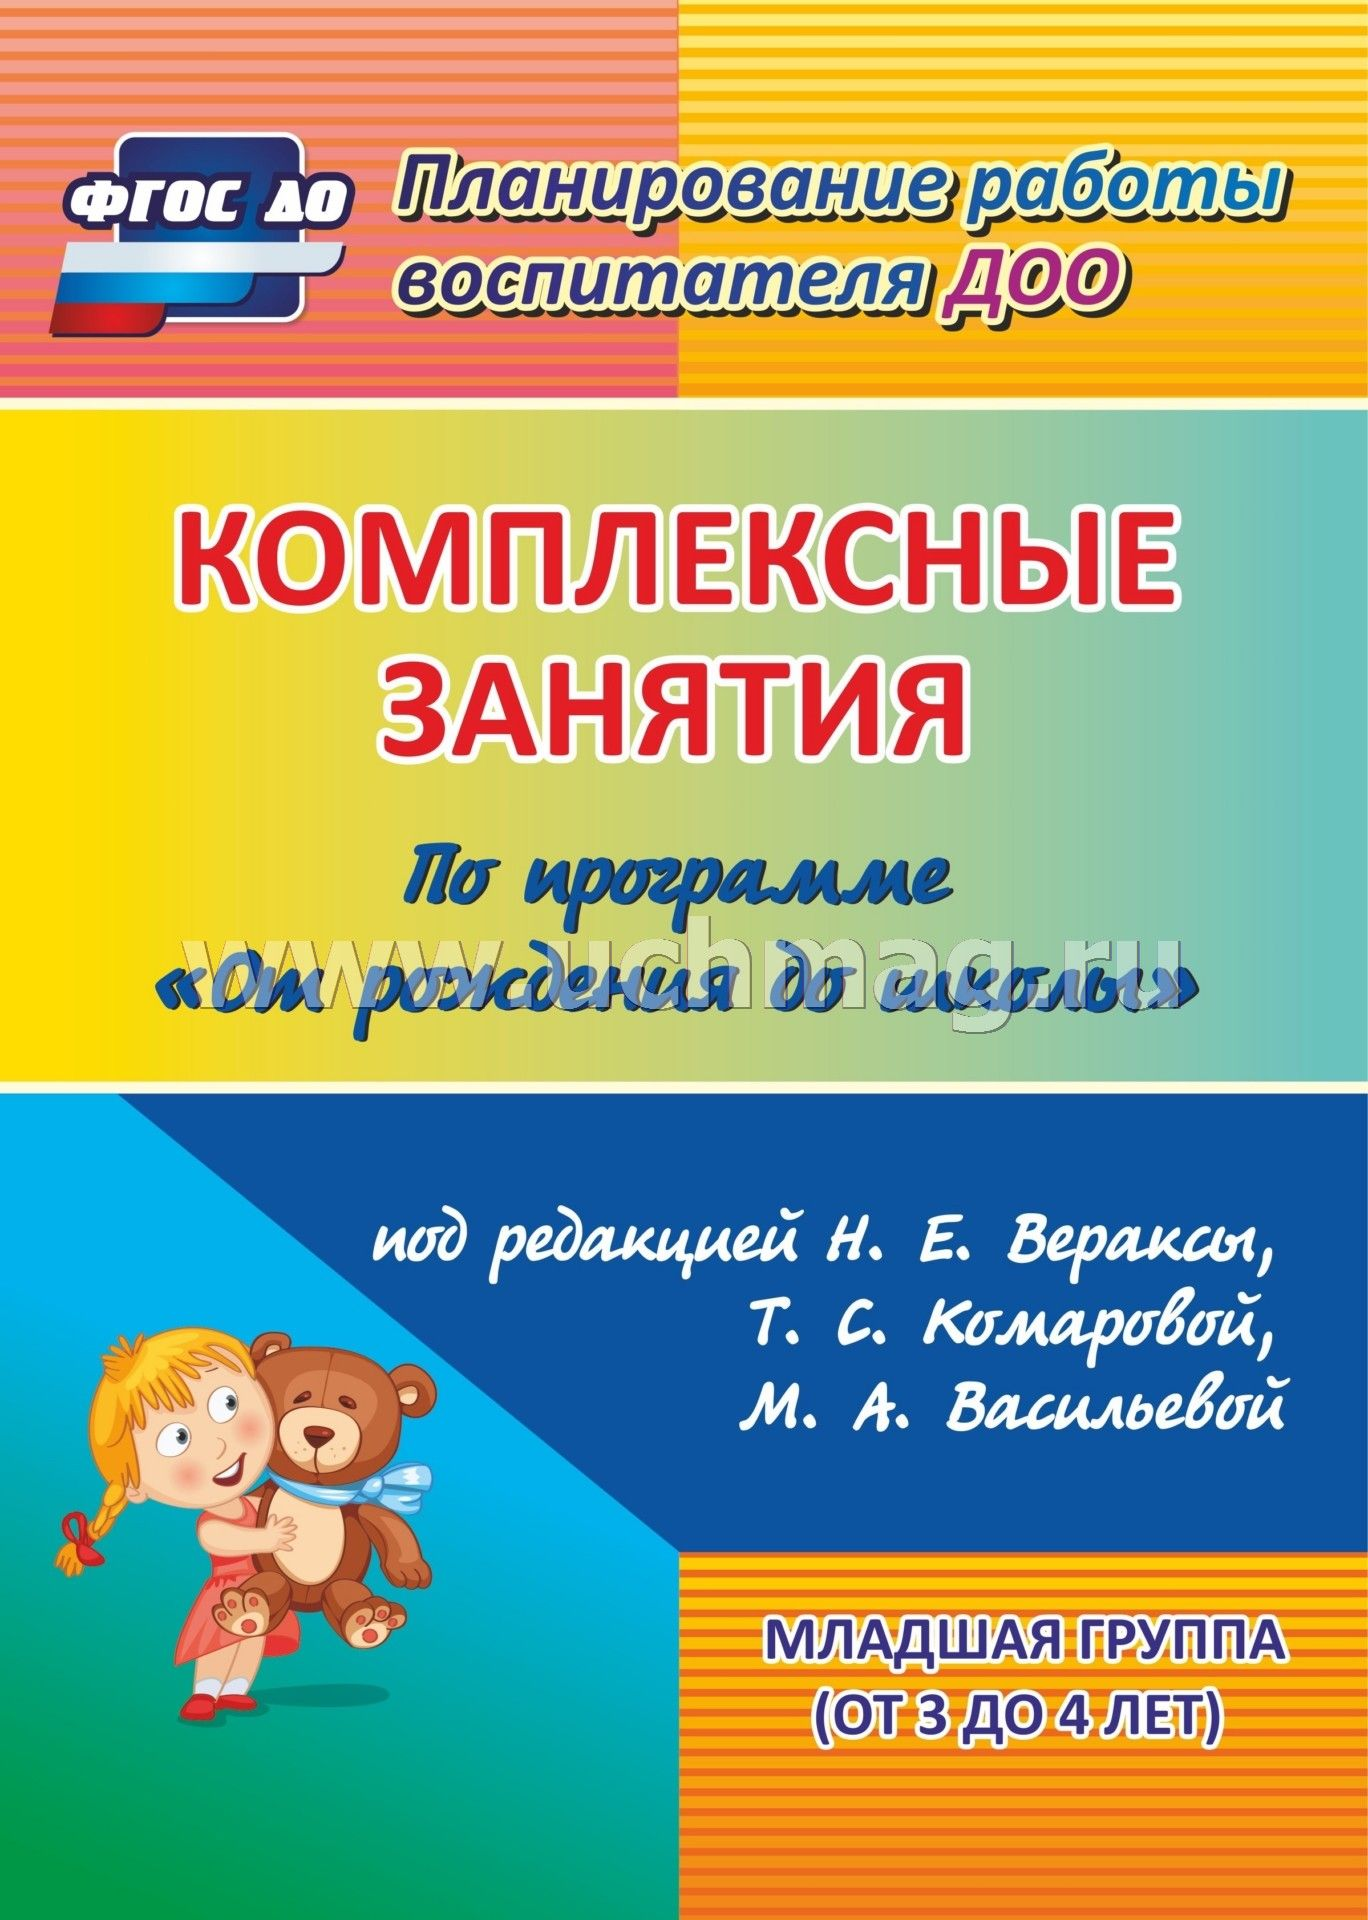 Полякова 2 Класс Рабочая Программа